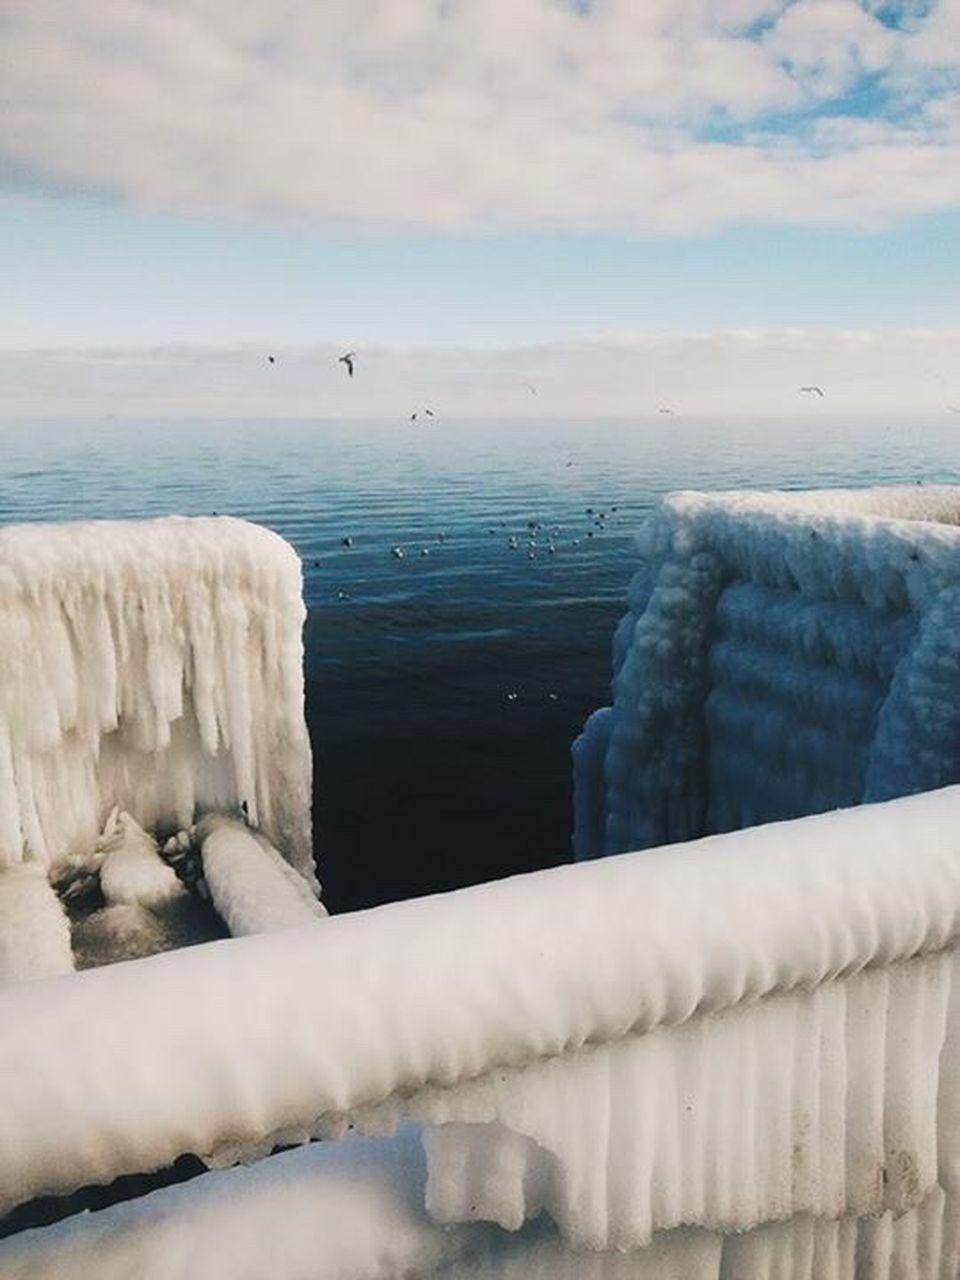 SNOW ON SEA AGAINST SKY